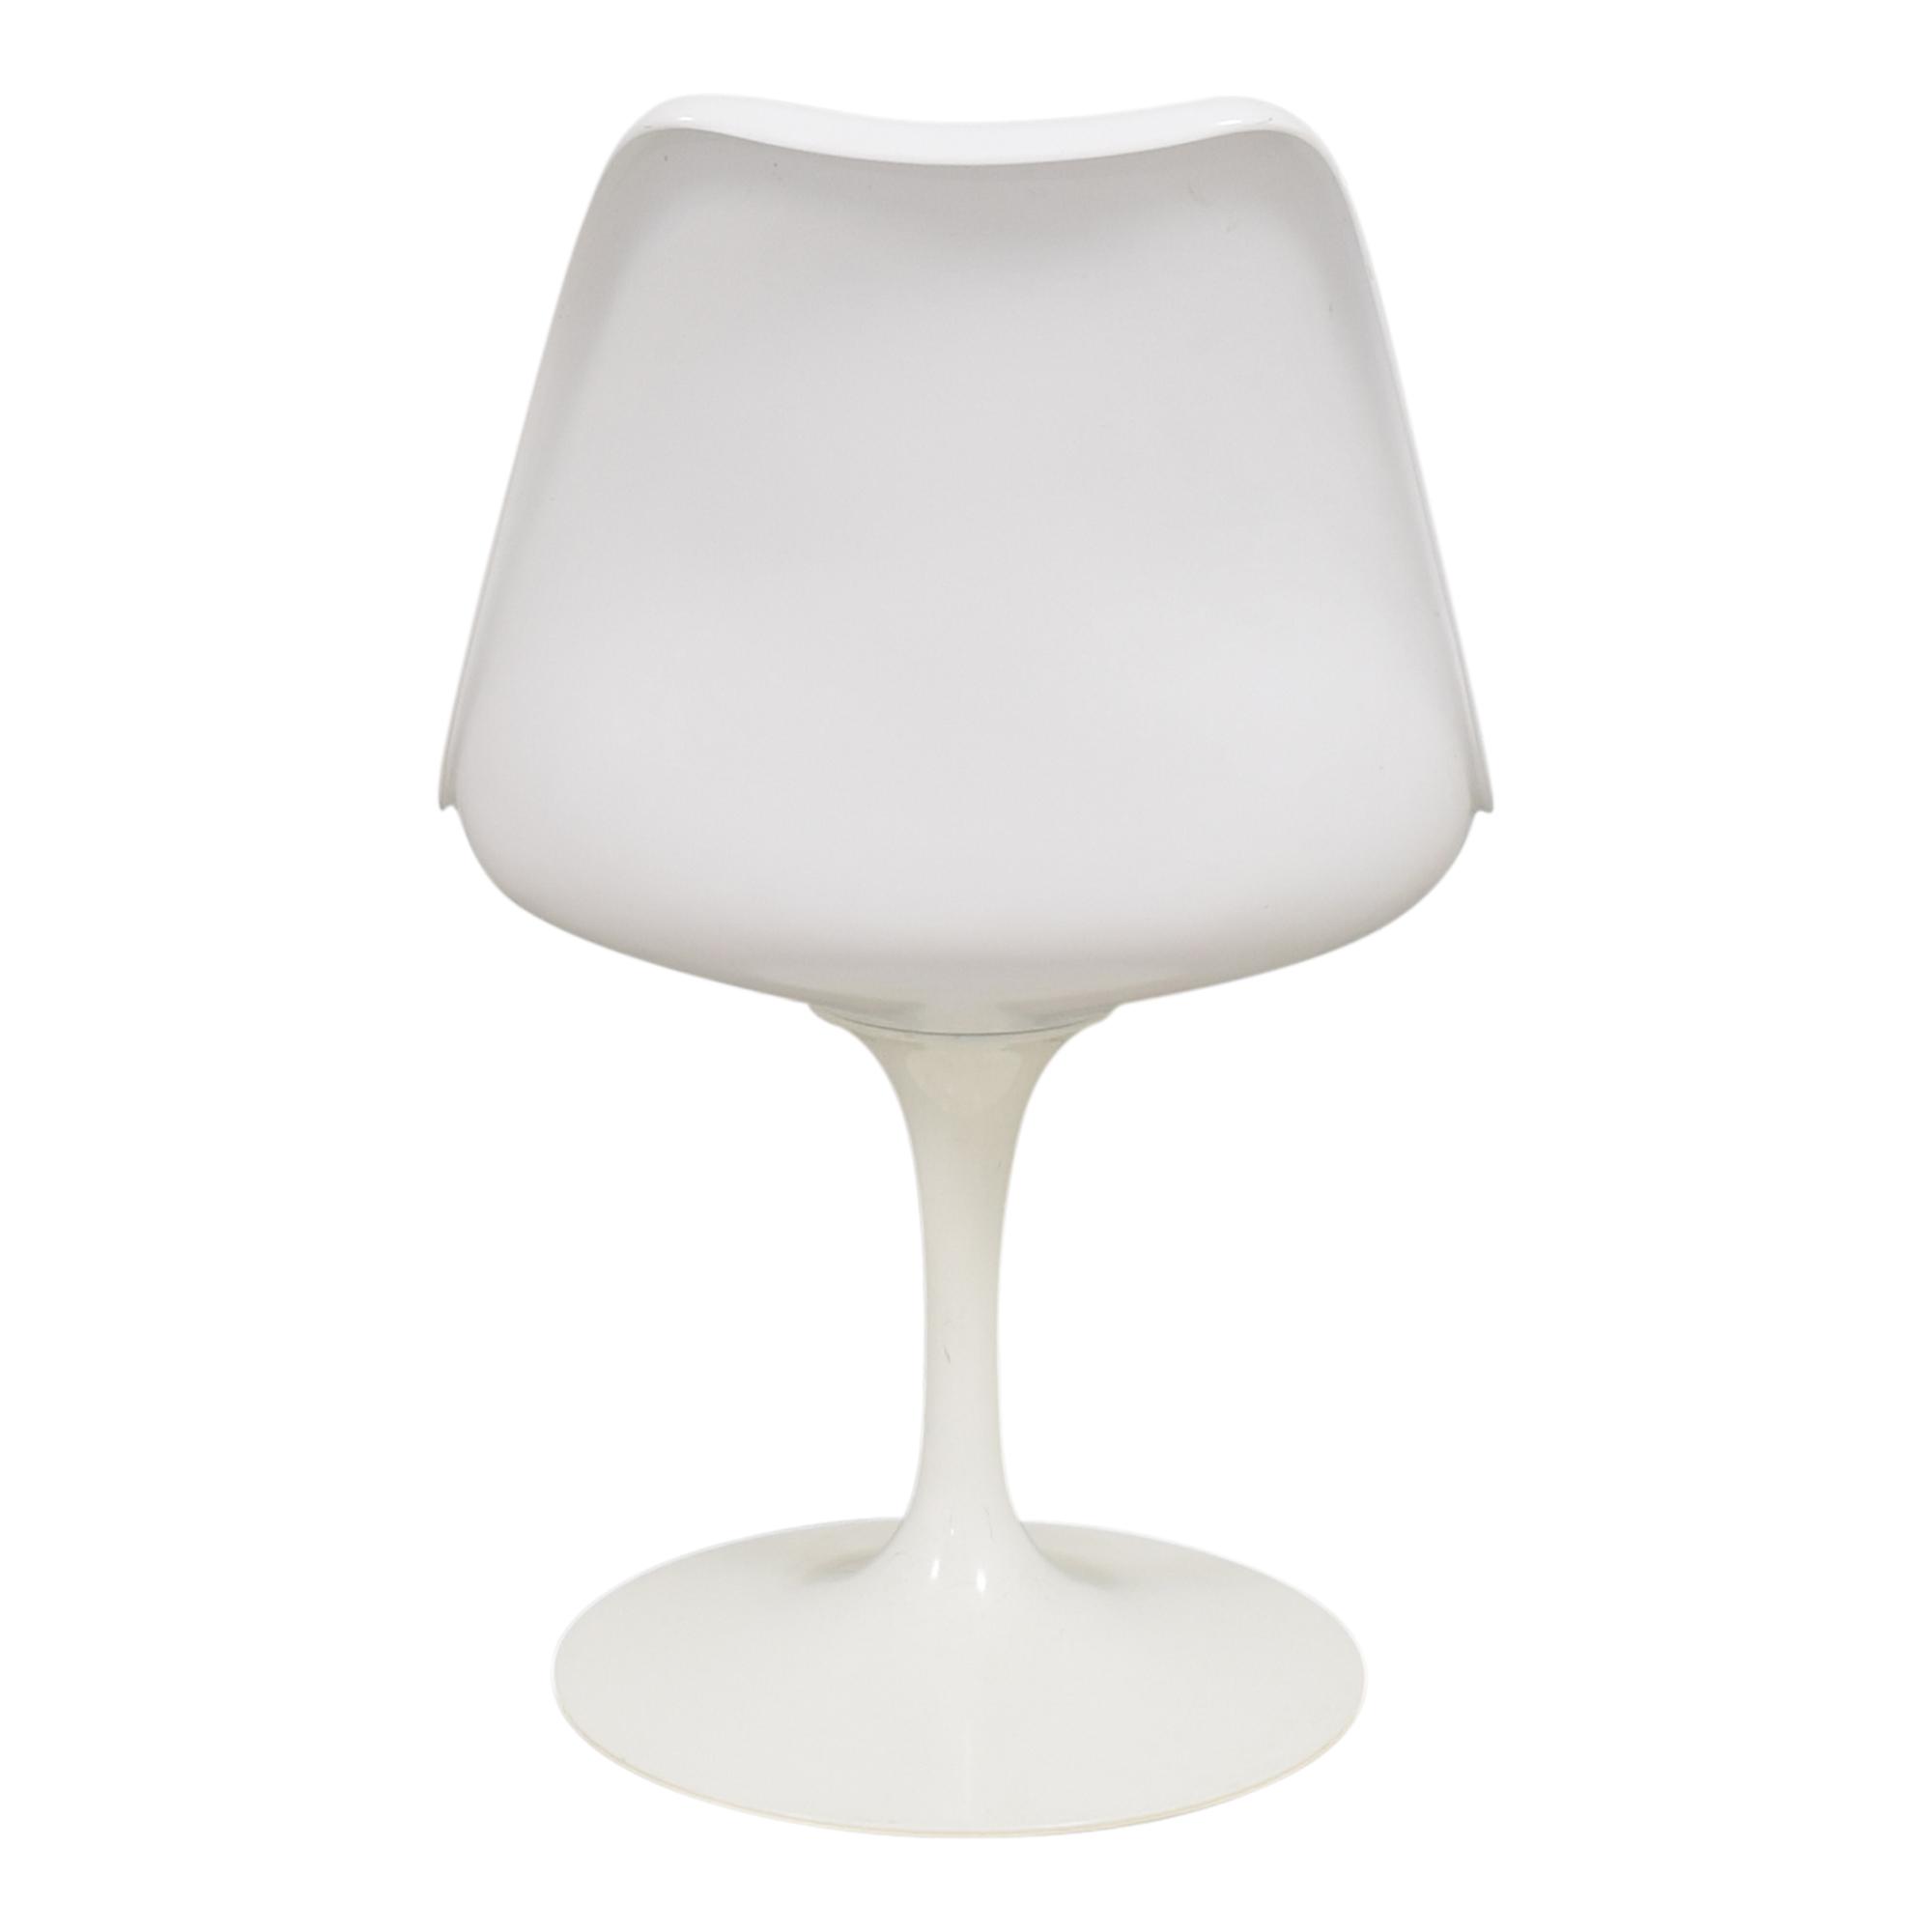 buy Knoll Knoll Tulip Eero Saarinen Chair online